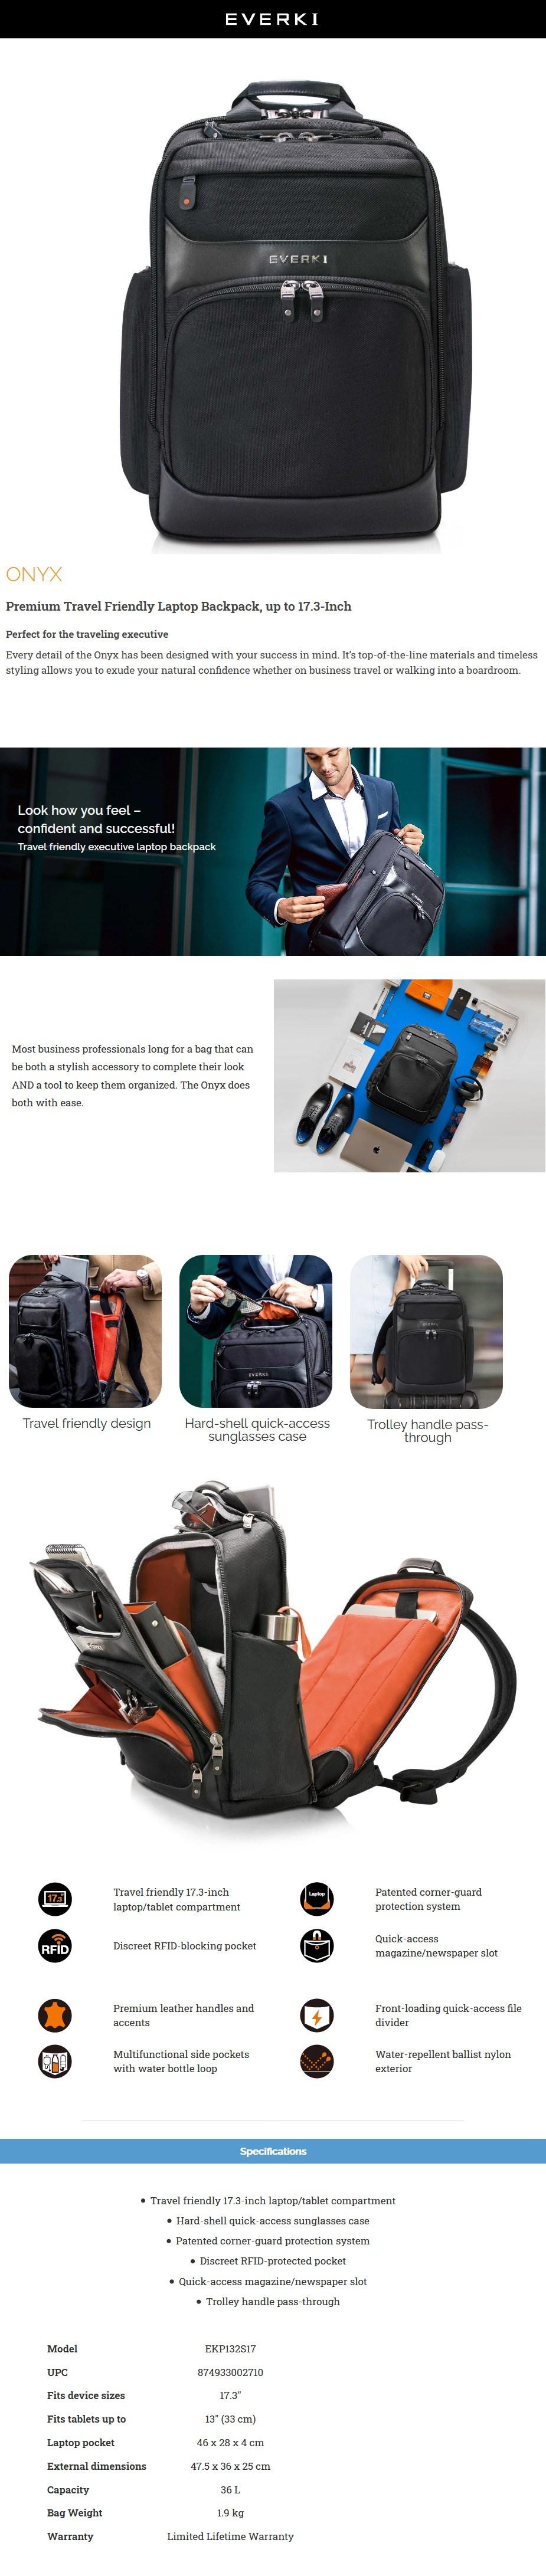 everki_173_onyx_premium_laptop_backpack_ac42131_6.jpg